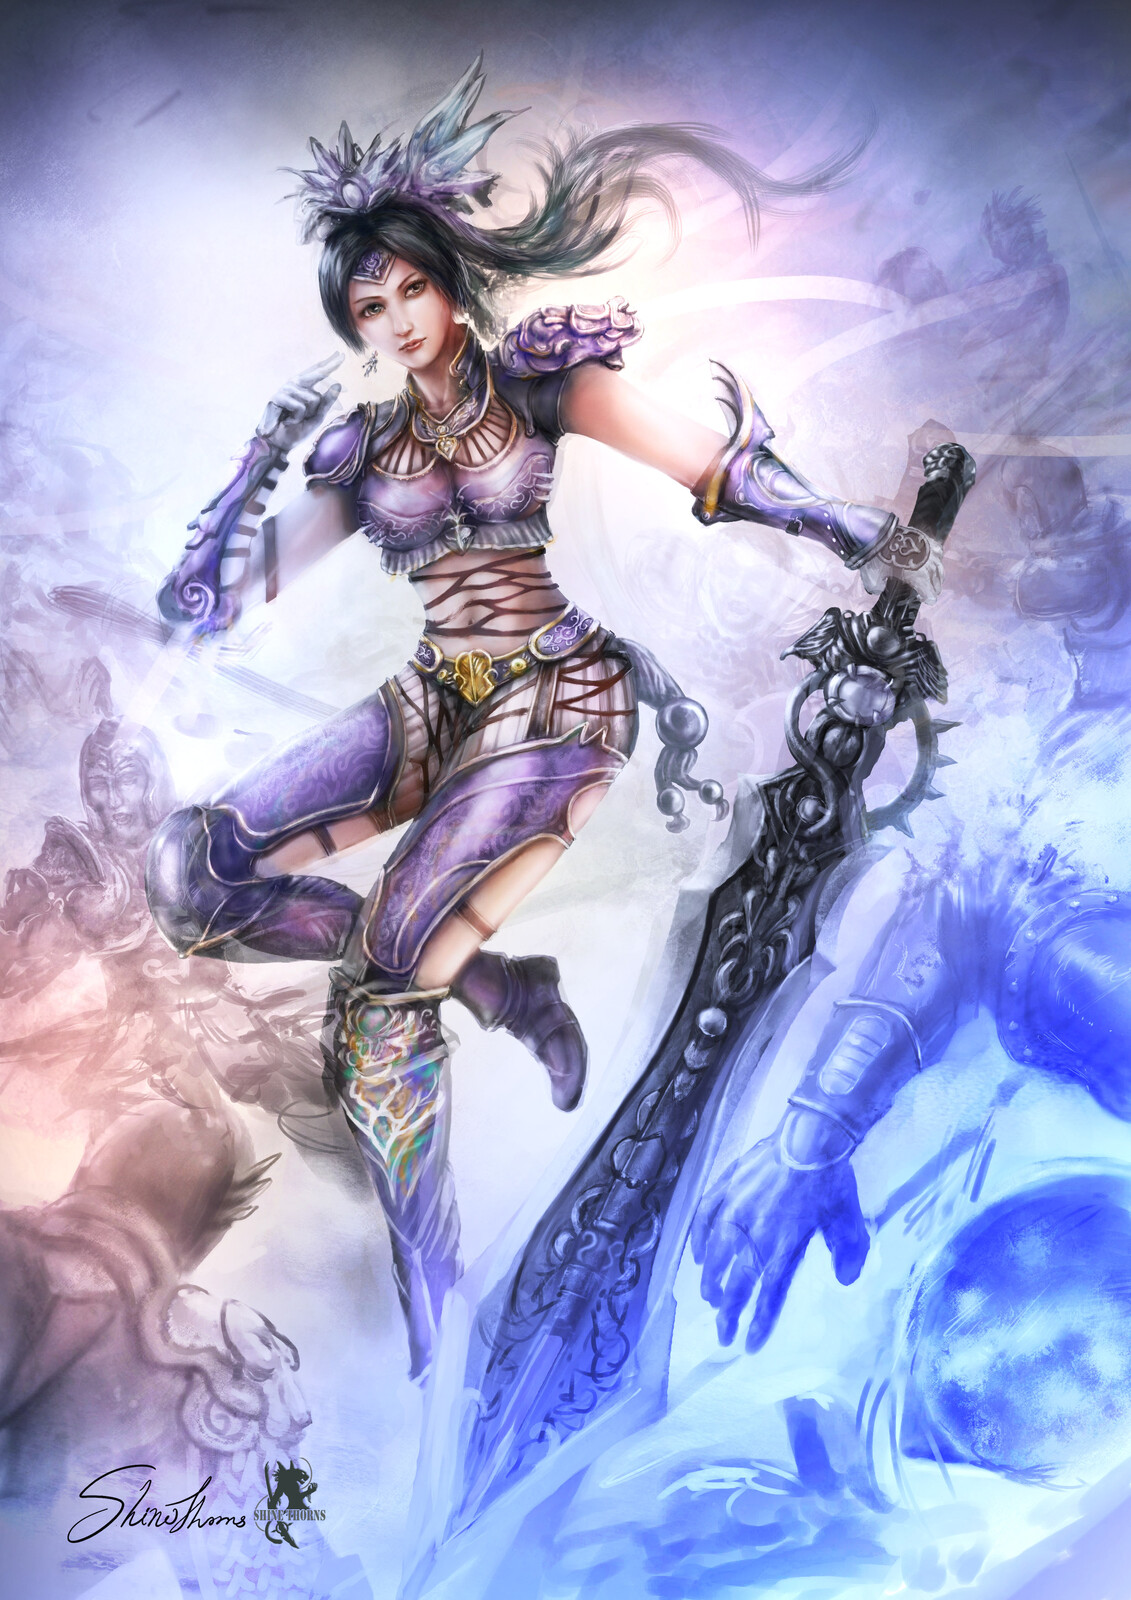 Female warrior 中國輕甲 武將